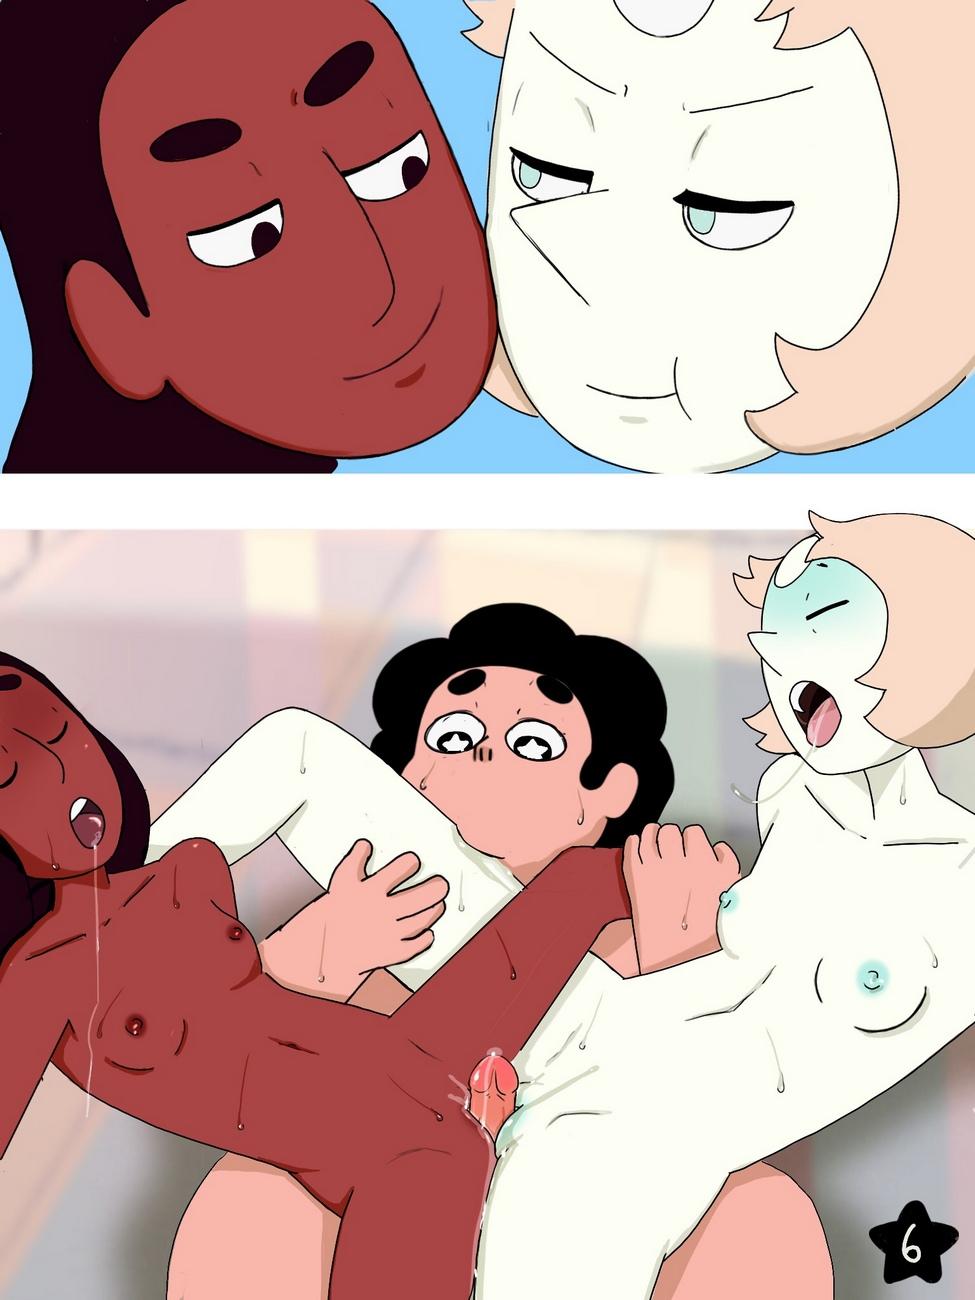 Steven universeporn